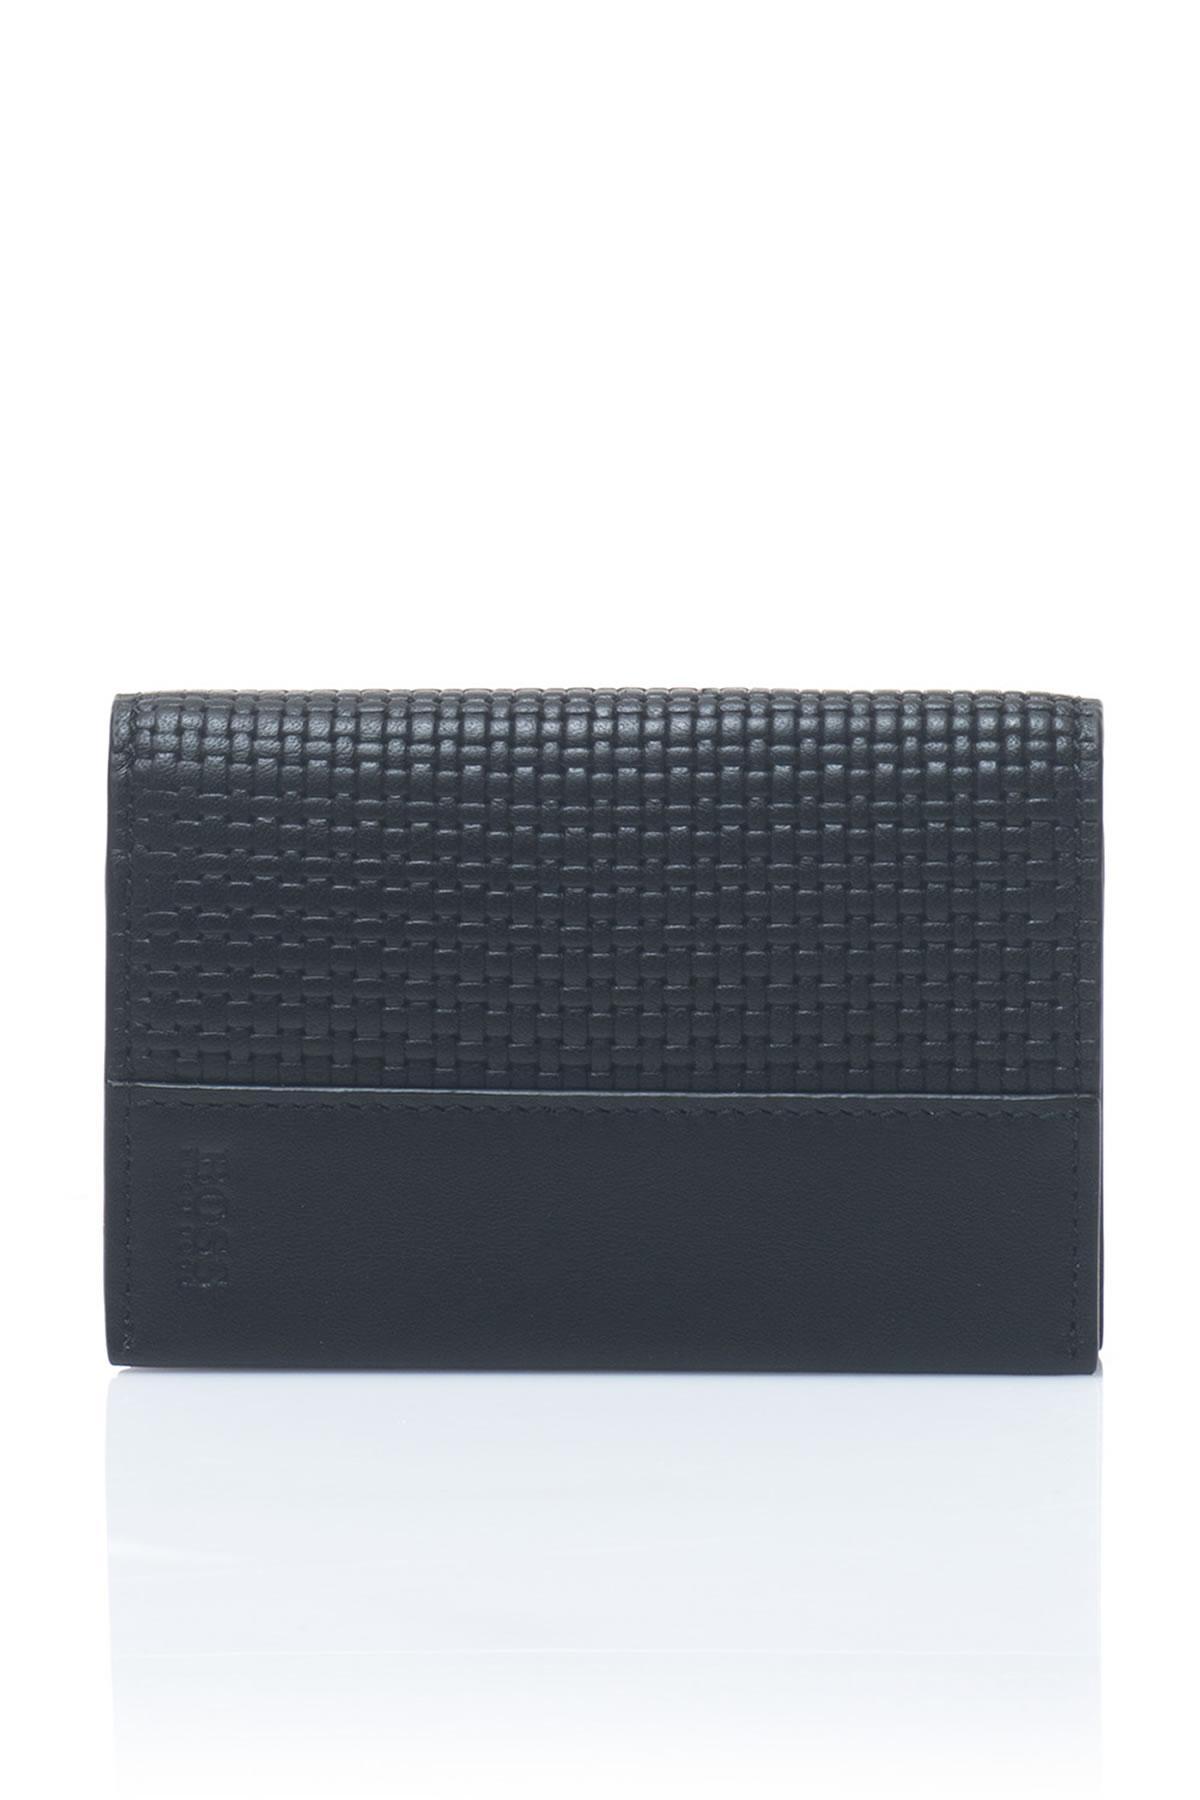 Lyst - Boss By Hugo Boss Leather Men\'s Wallet in Black for Men - Save 6%